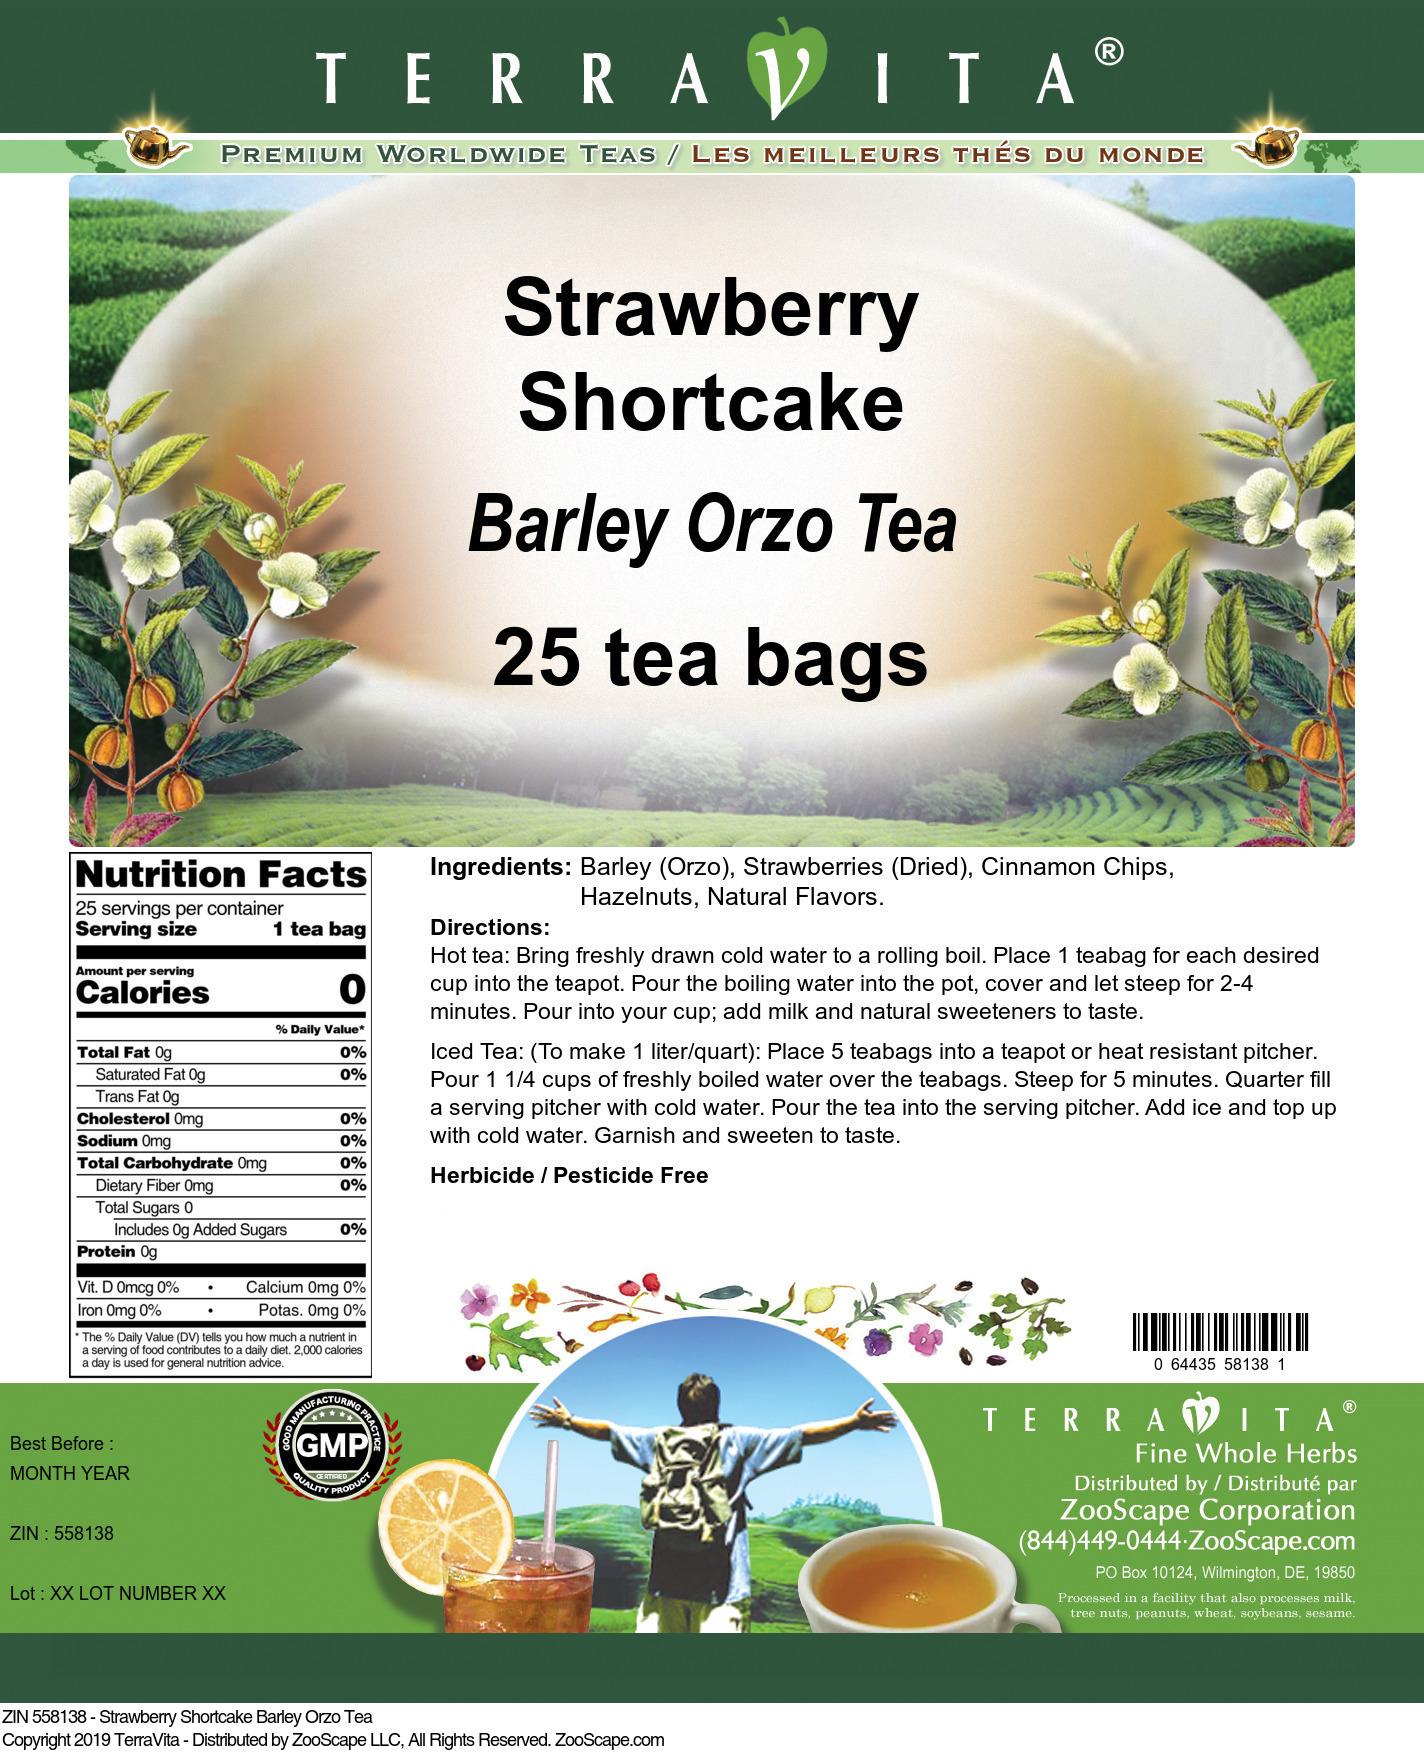 Strawberry Shortcake Barley Orzo Tea